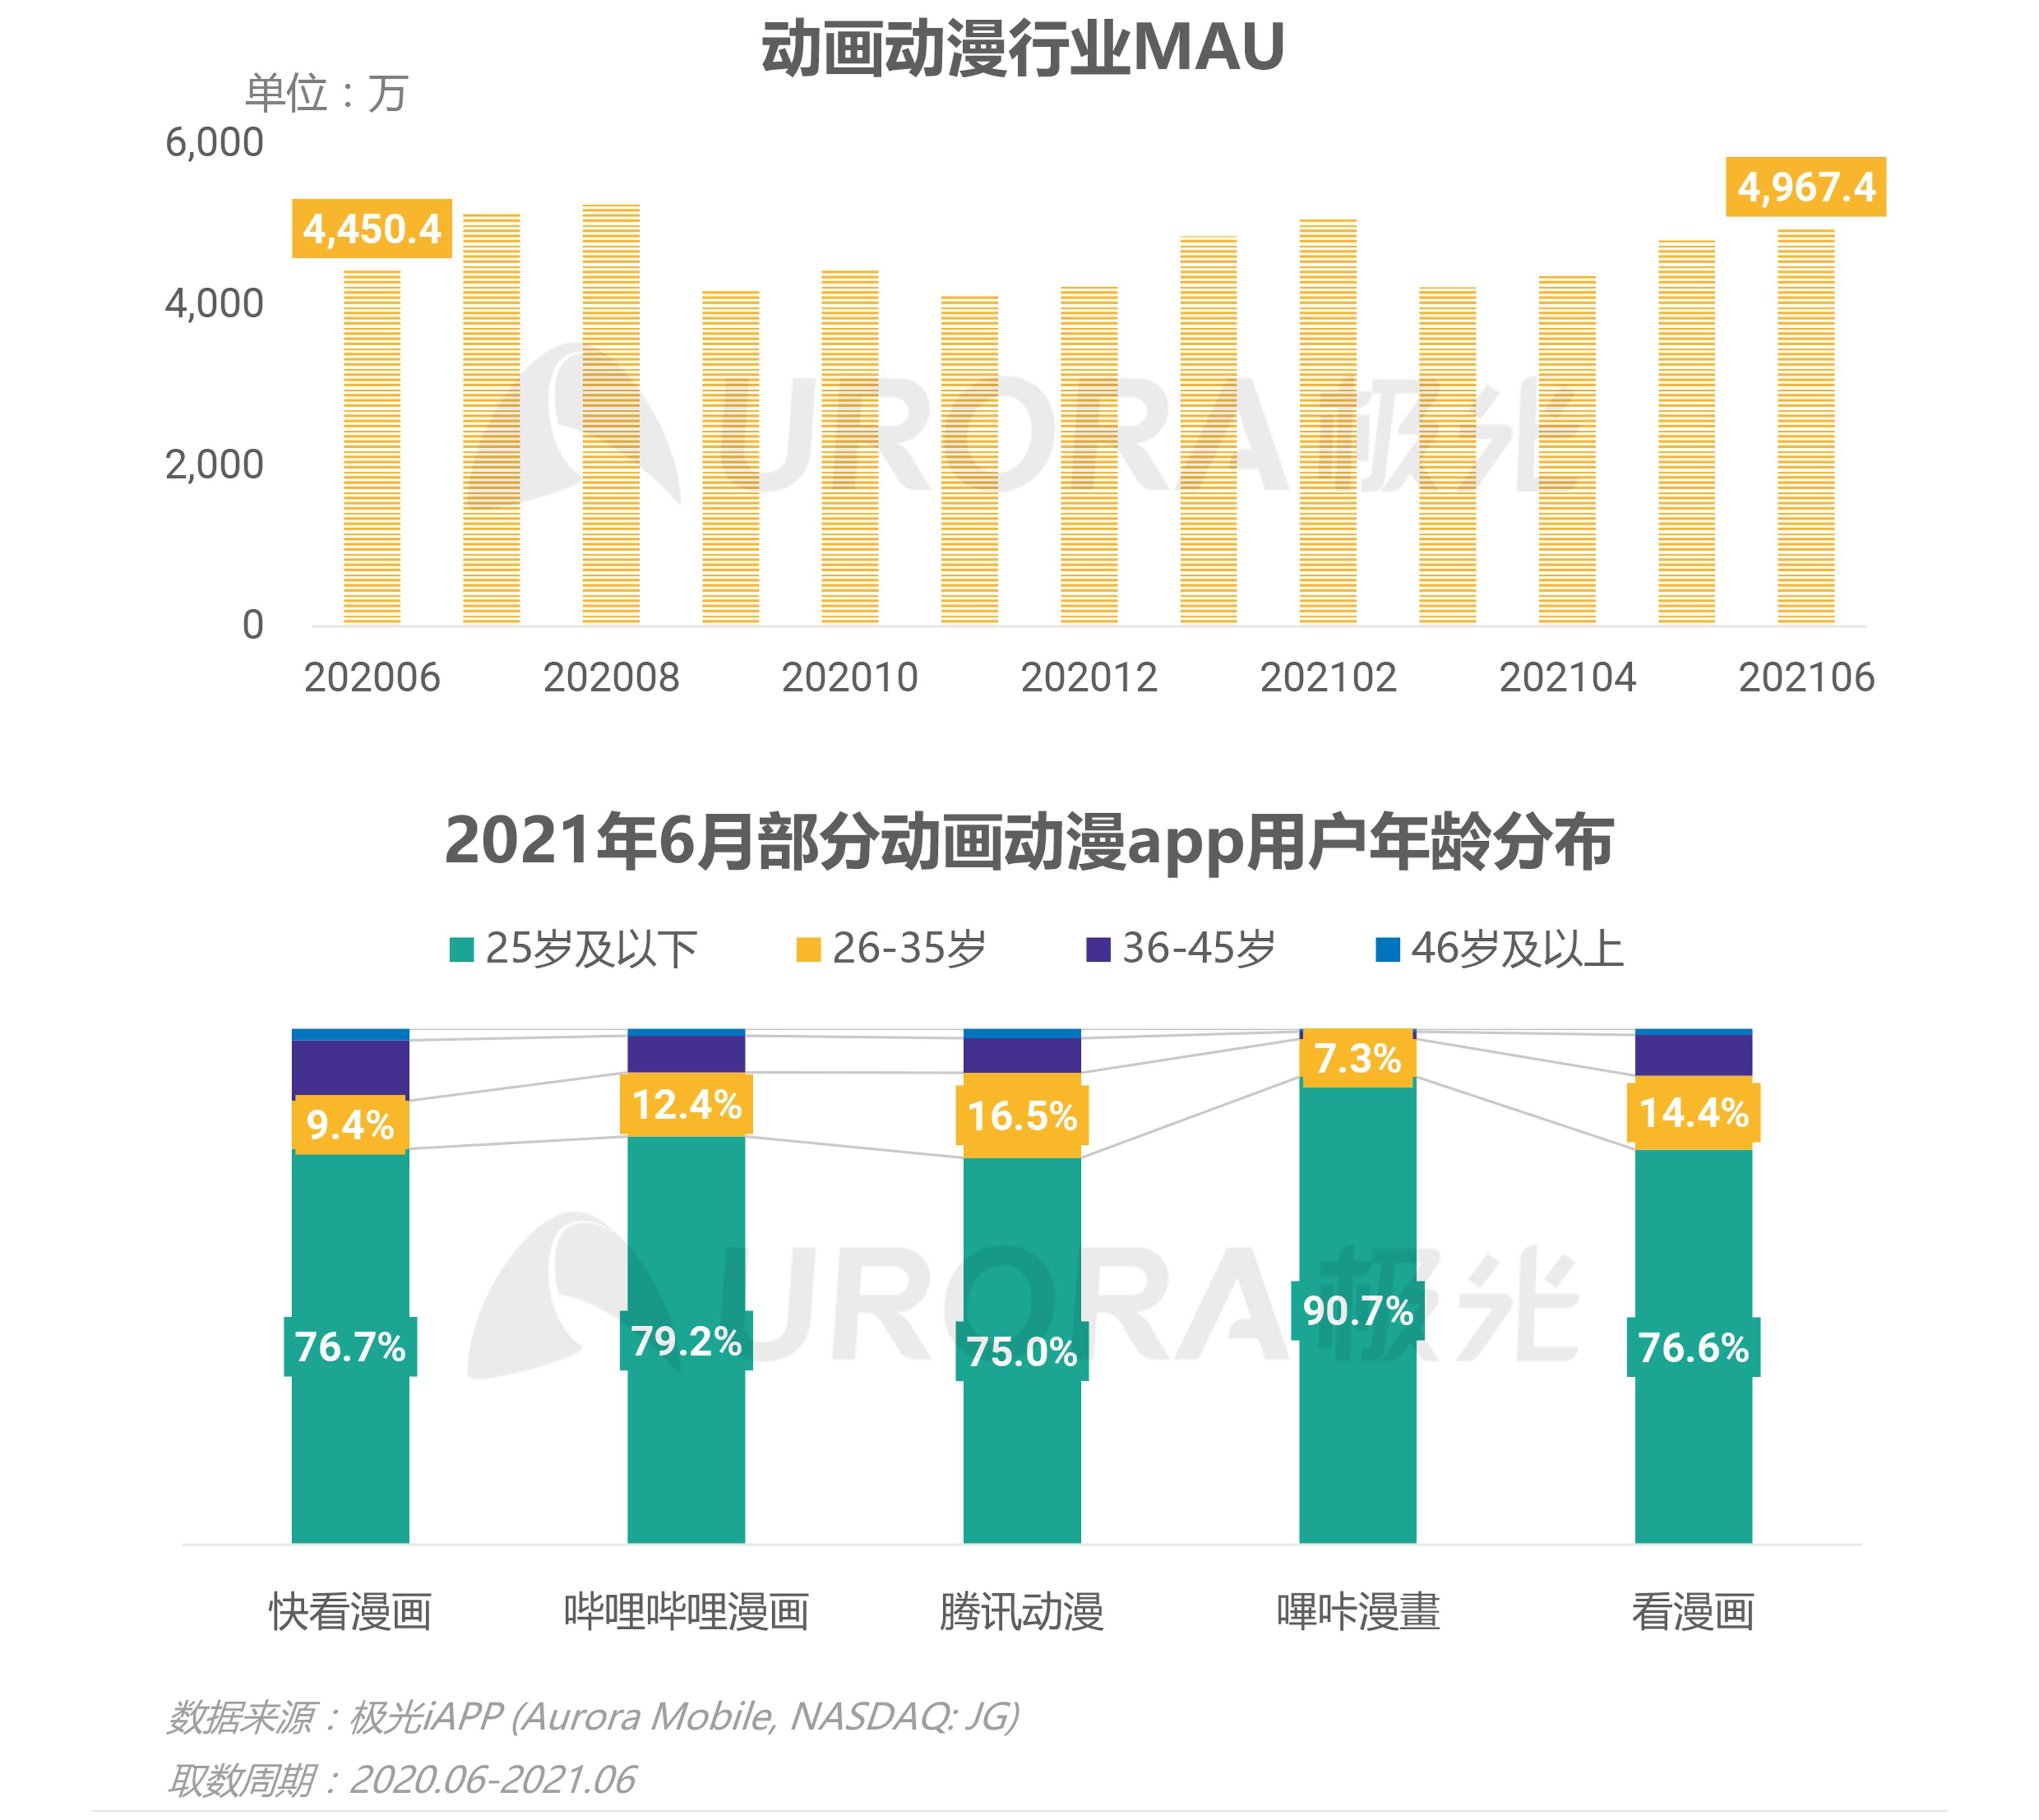 2021Q2季度报告_20210727_终稿-37.png